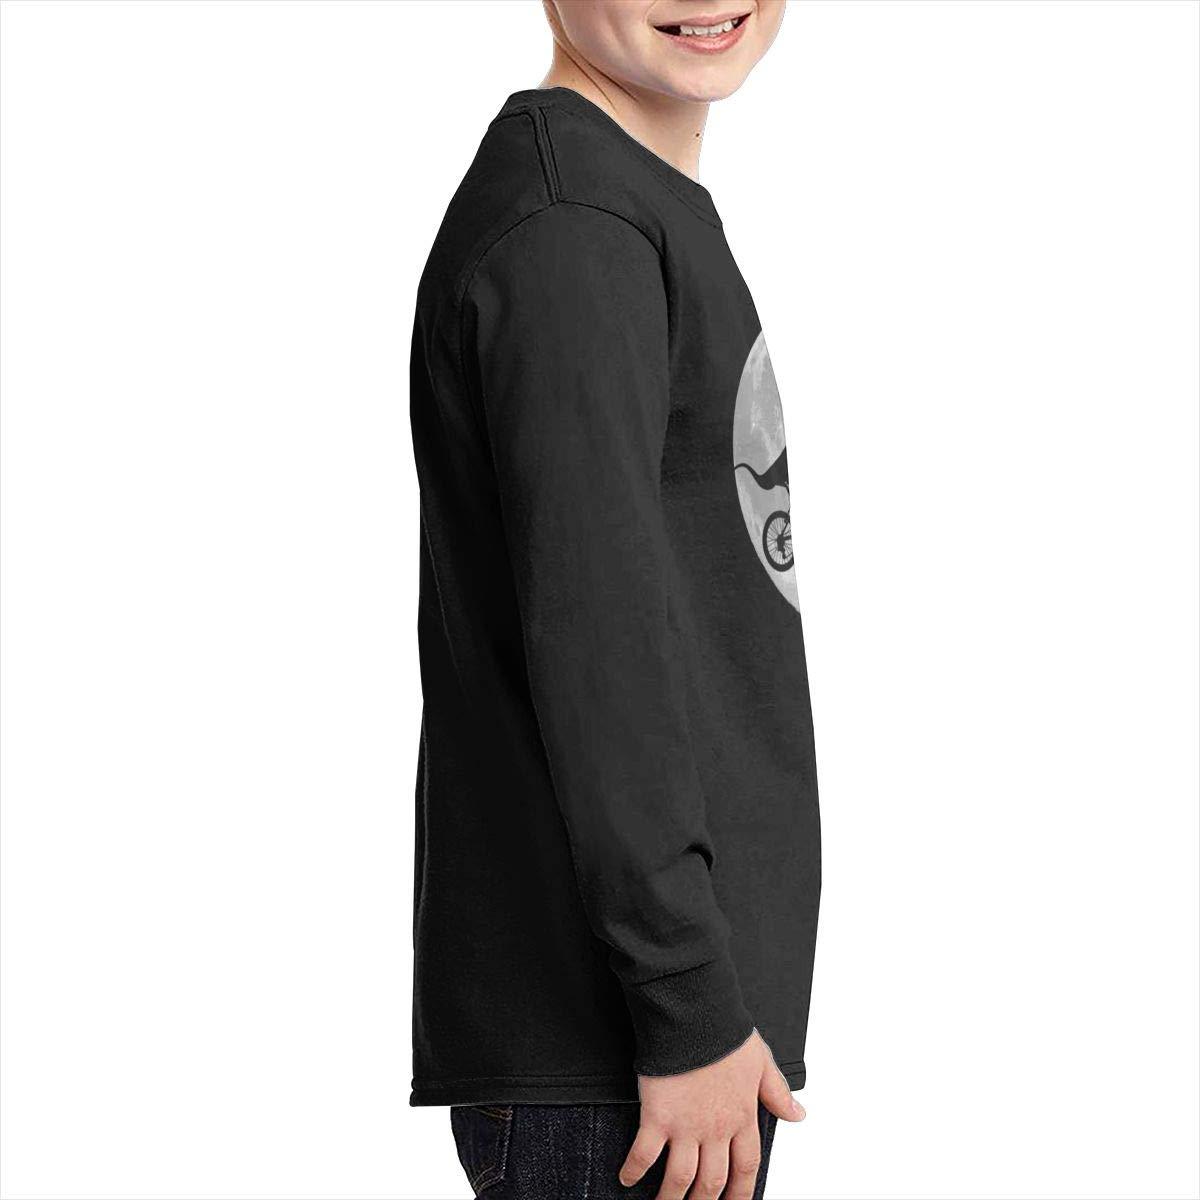 Qiop Nee Dinosaur Moon Bike Long Sleeve T-Shirt for Girls